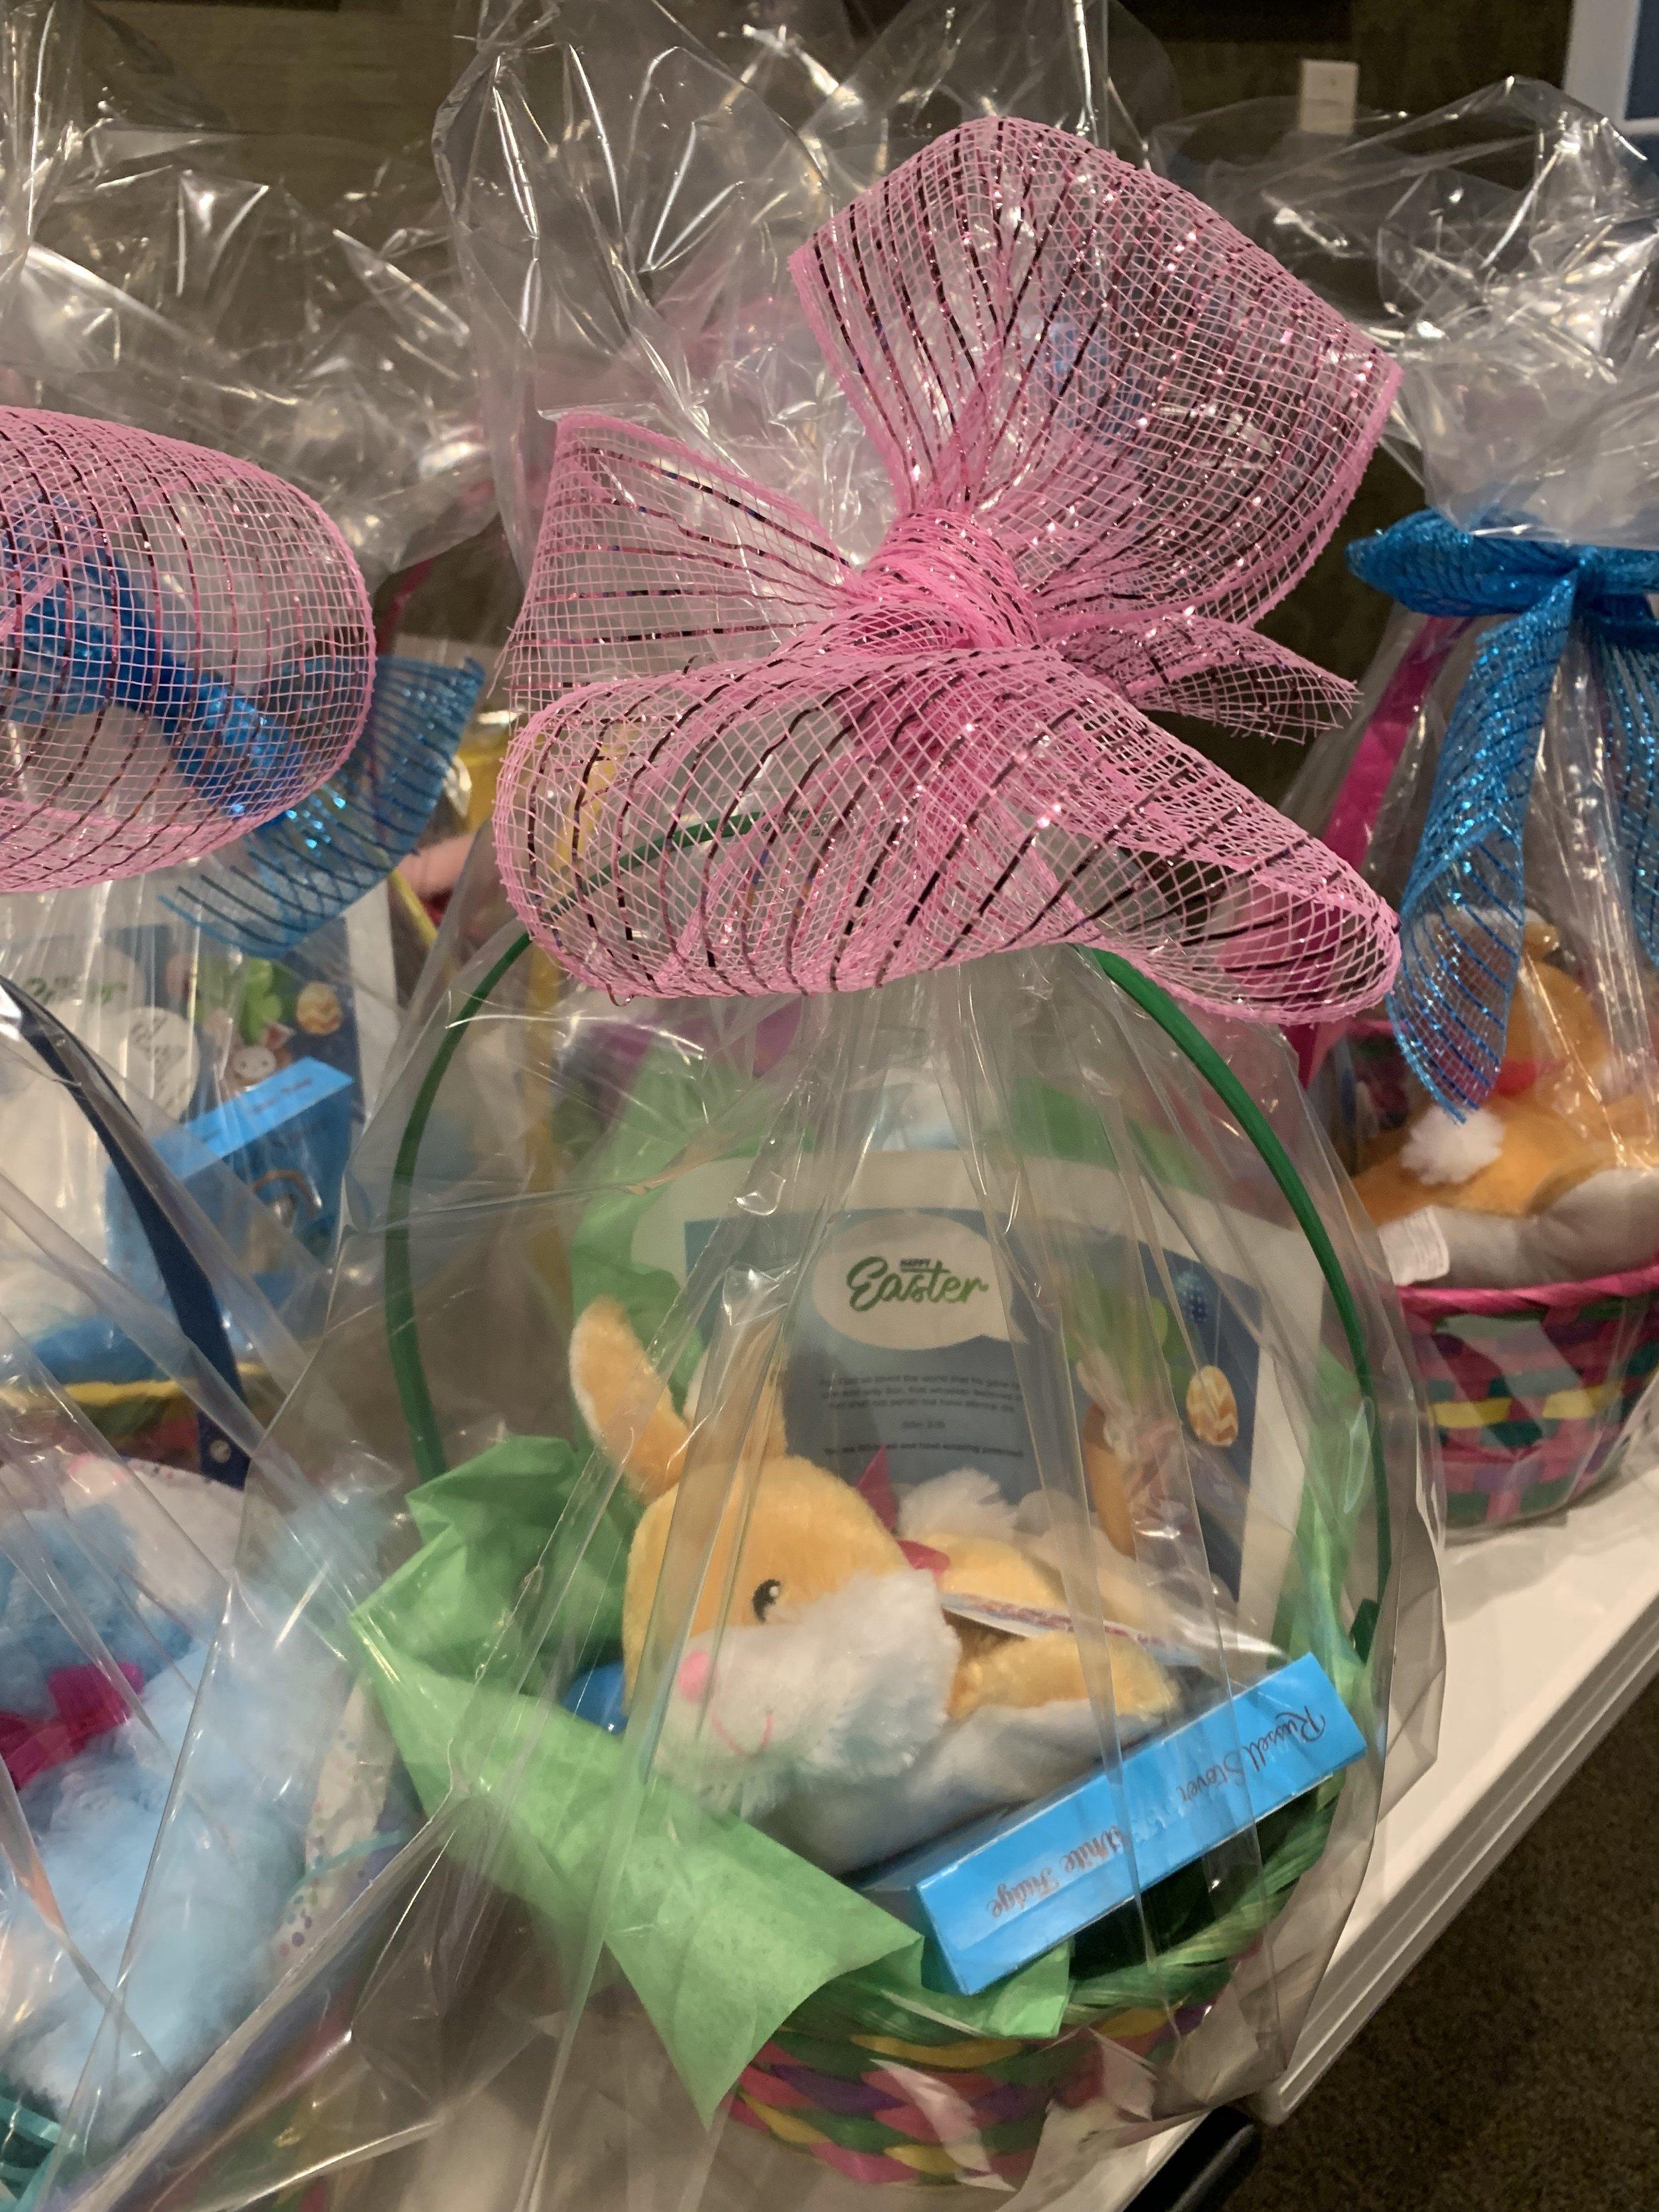 Easter baskets for the Detroit public school children.